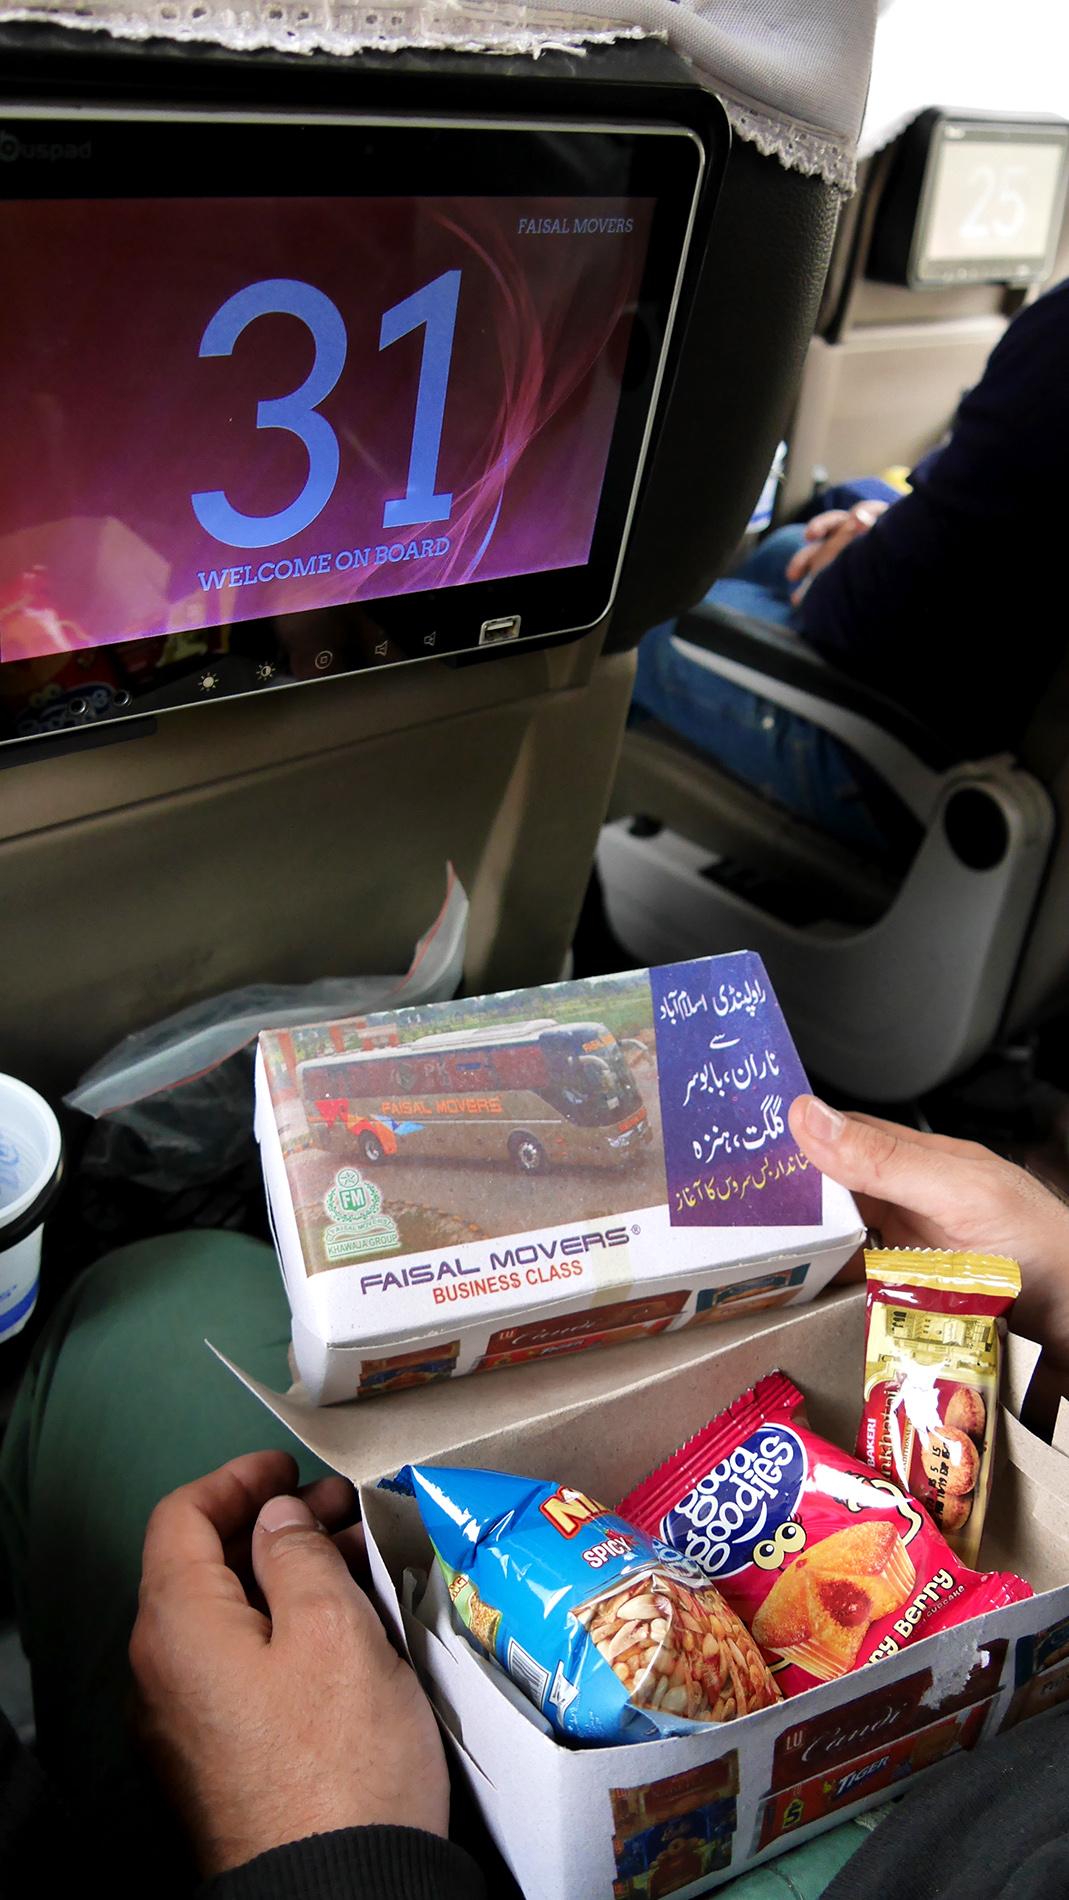 Business class snackbox